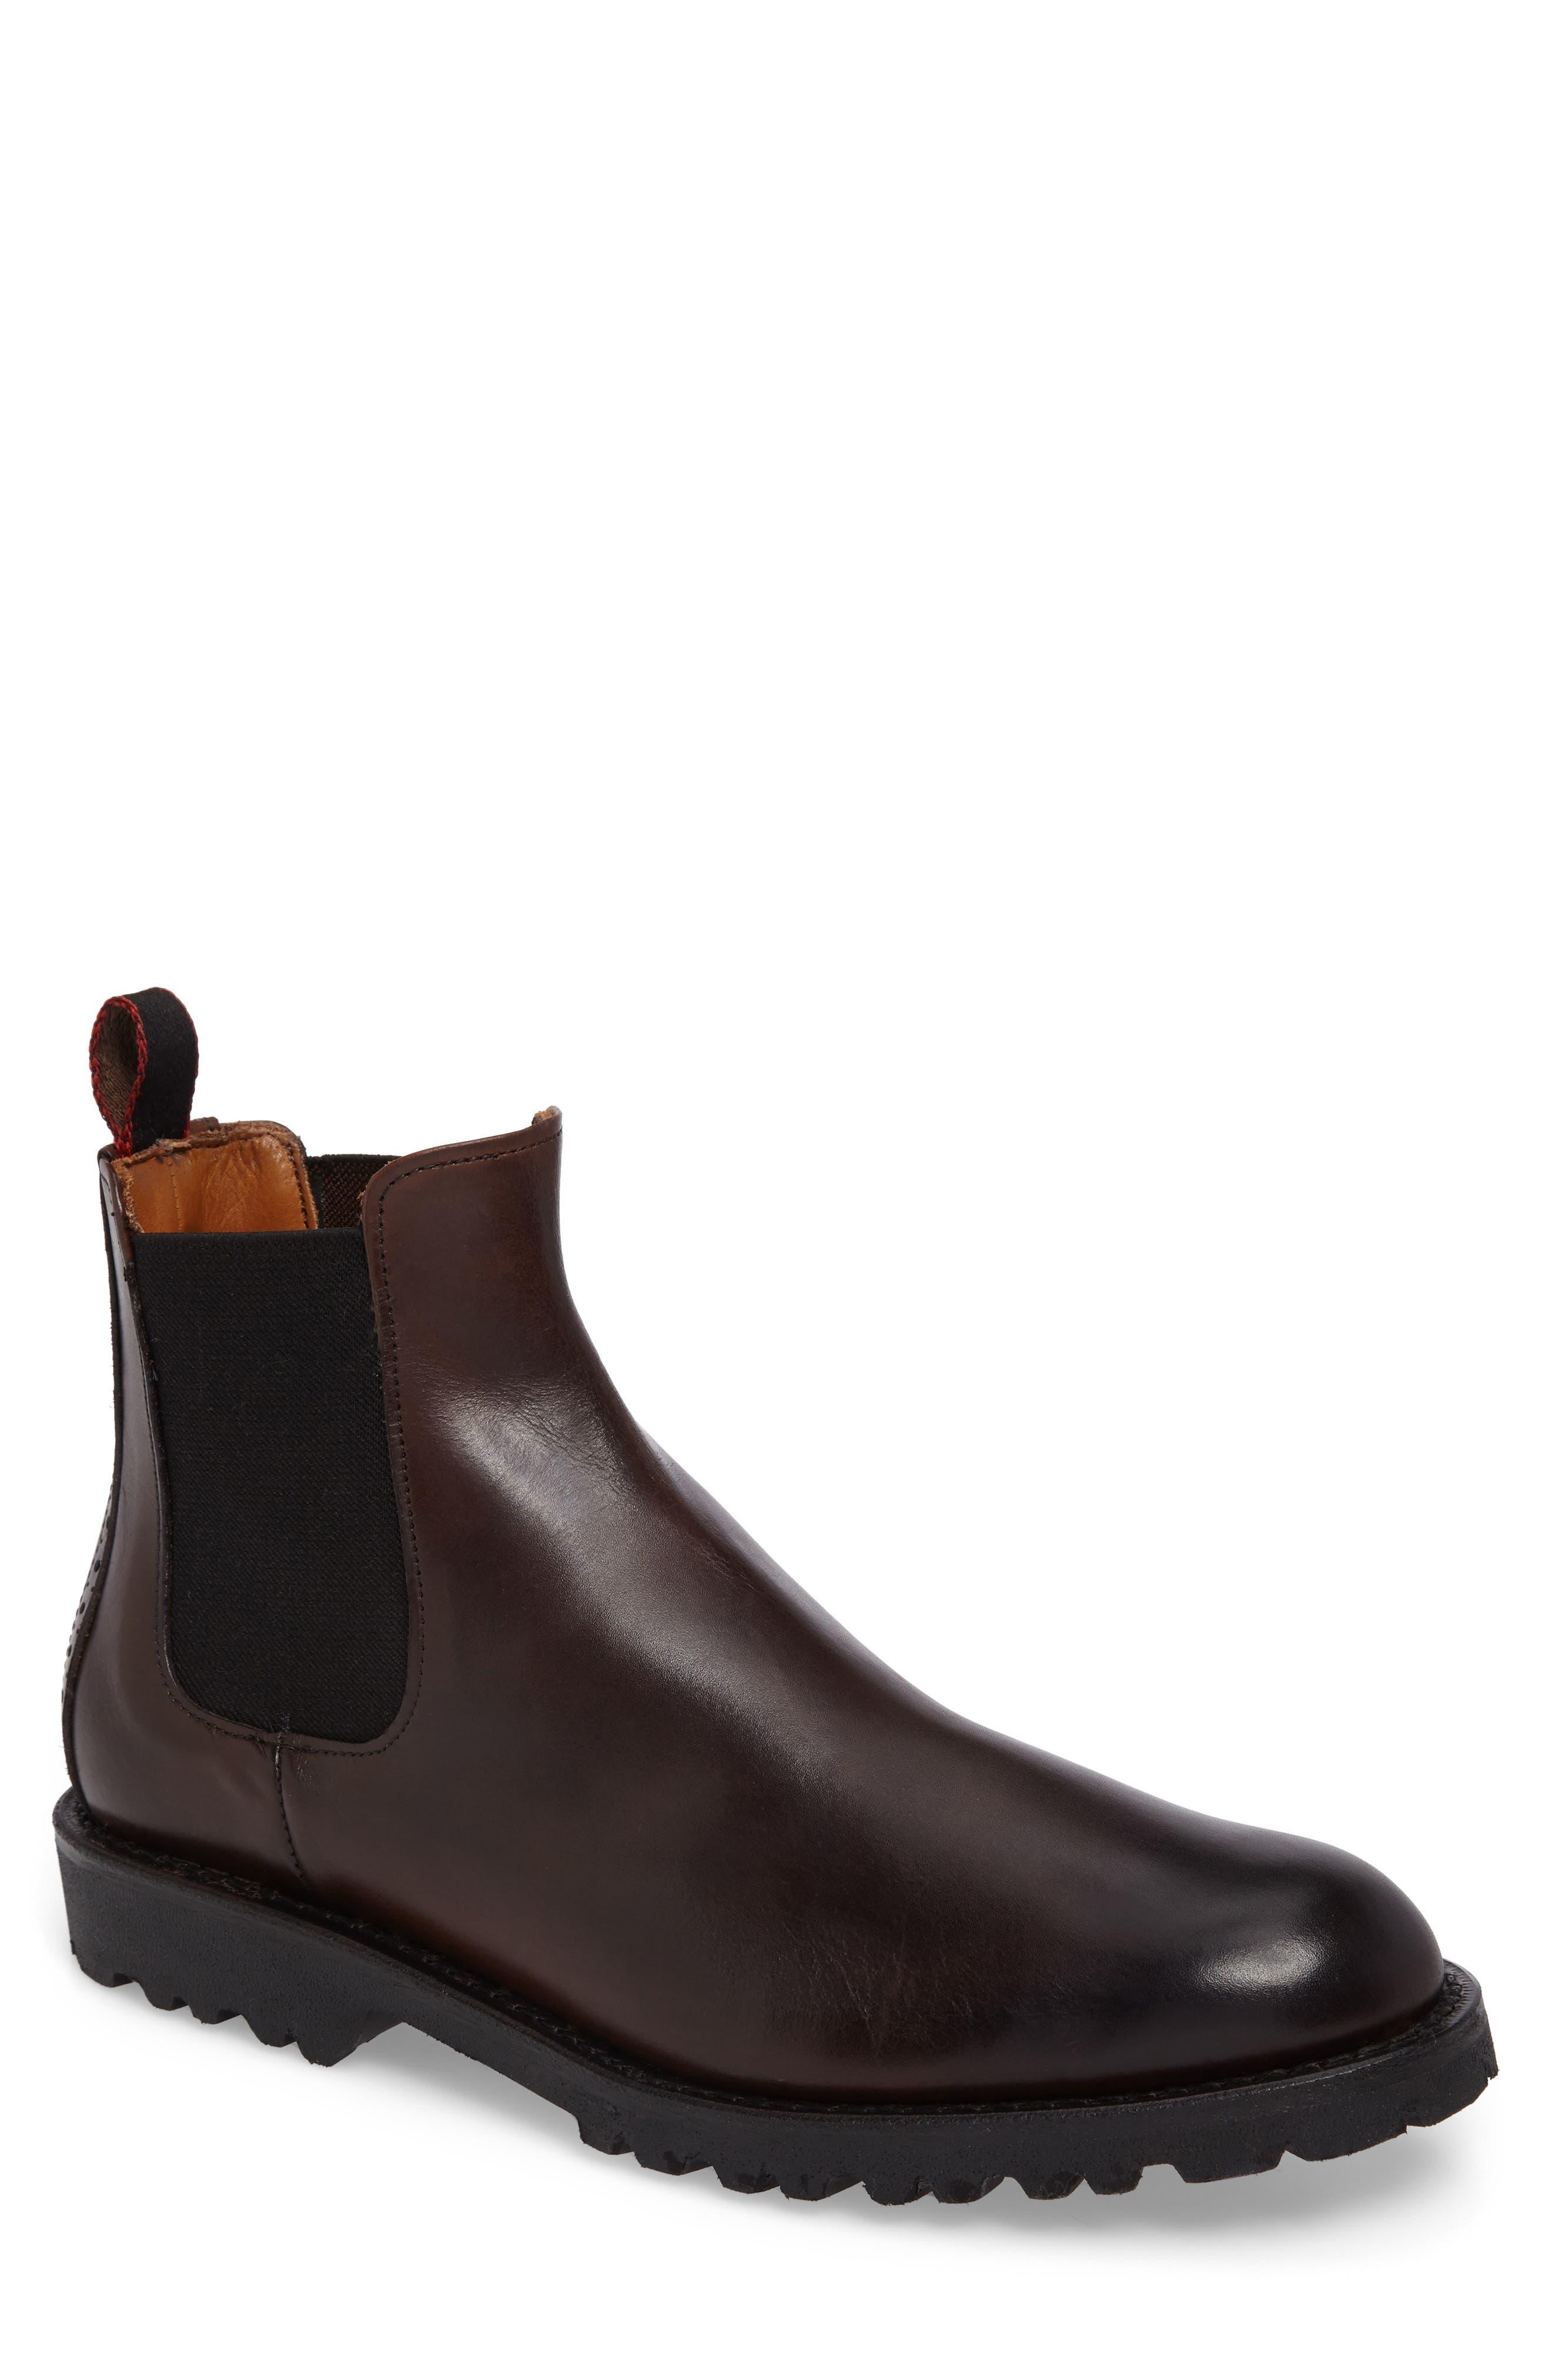 Alternate Image 1 Selected - Allen Edmonds Tate Chelsea Boot (Men)